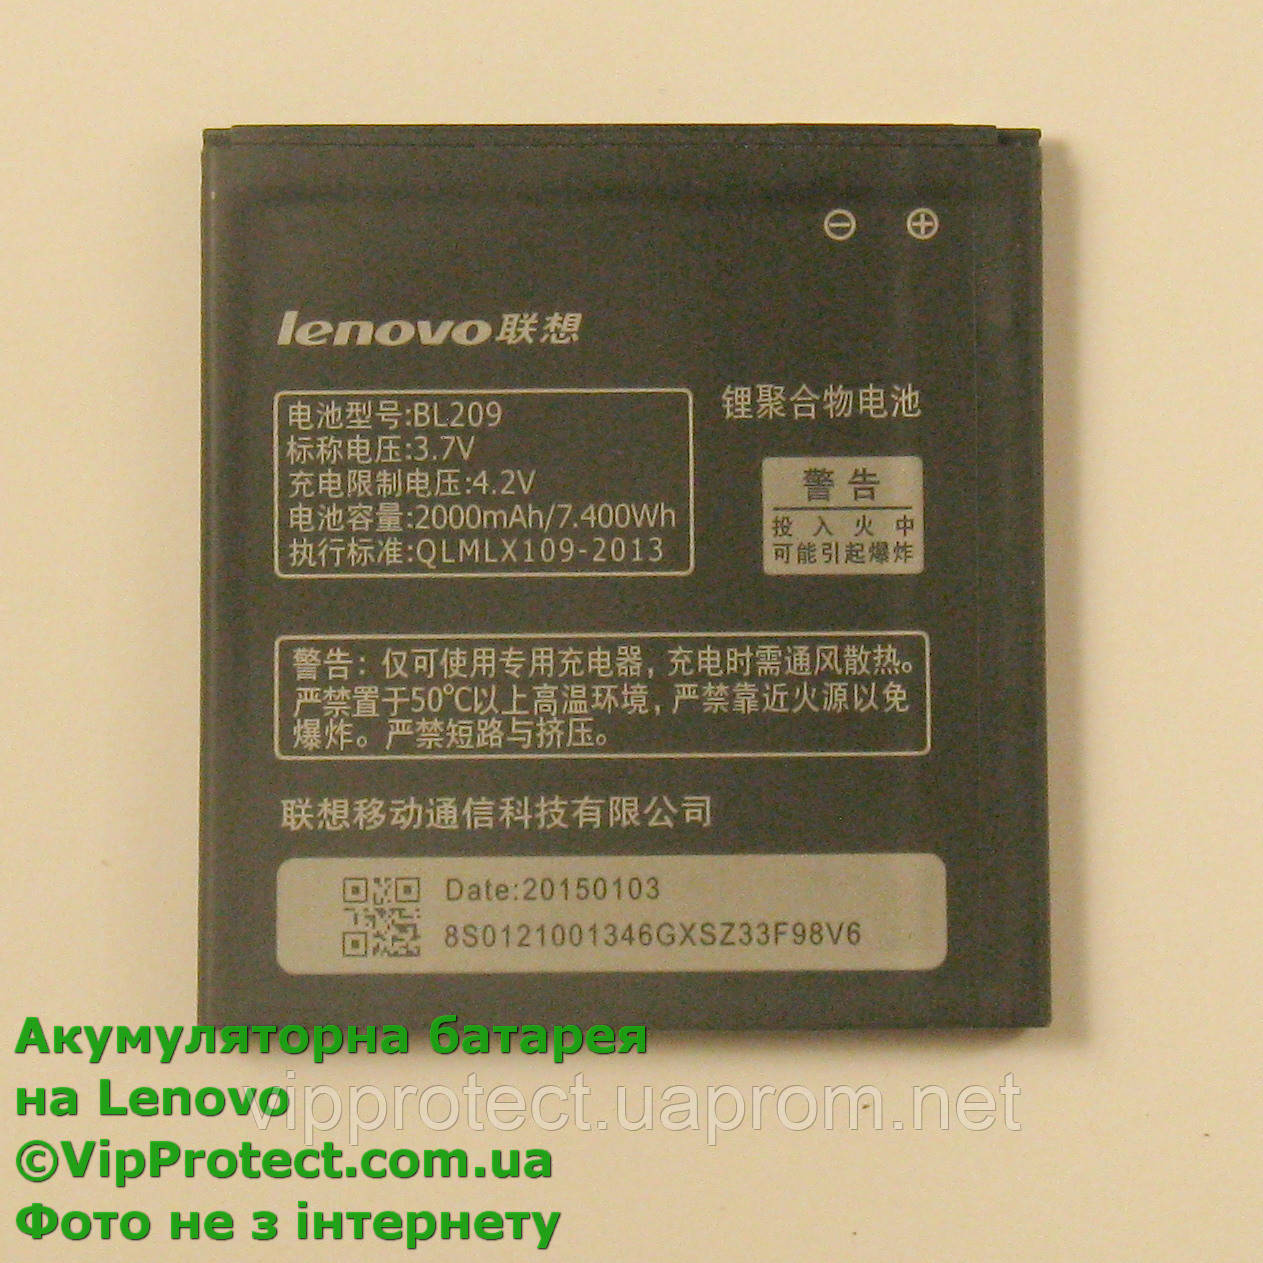 Lenovo A760 BL209 акумулятор 2000 мА⋅год оригінальний